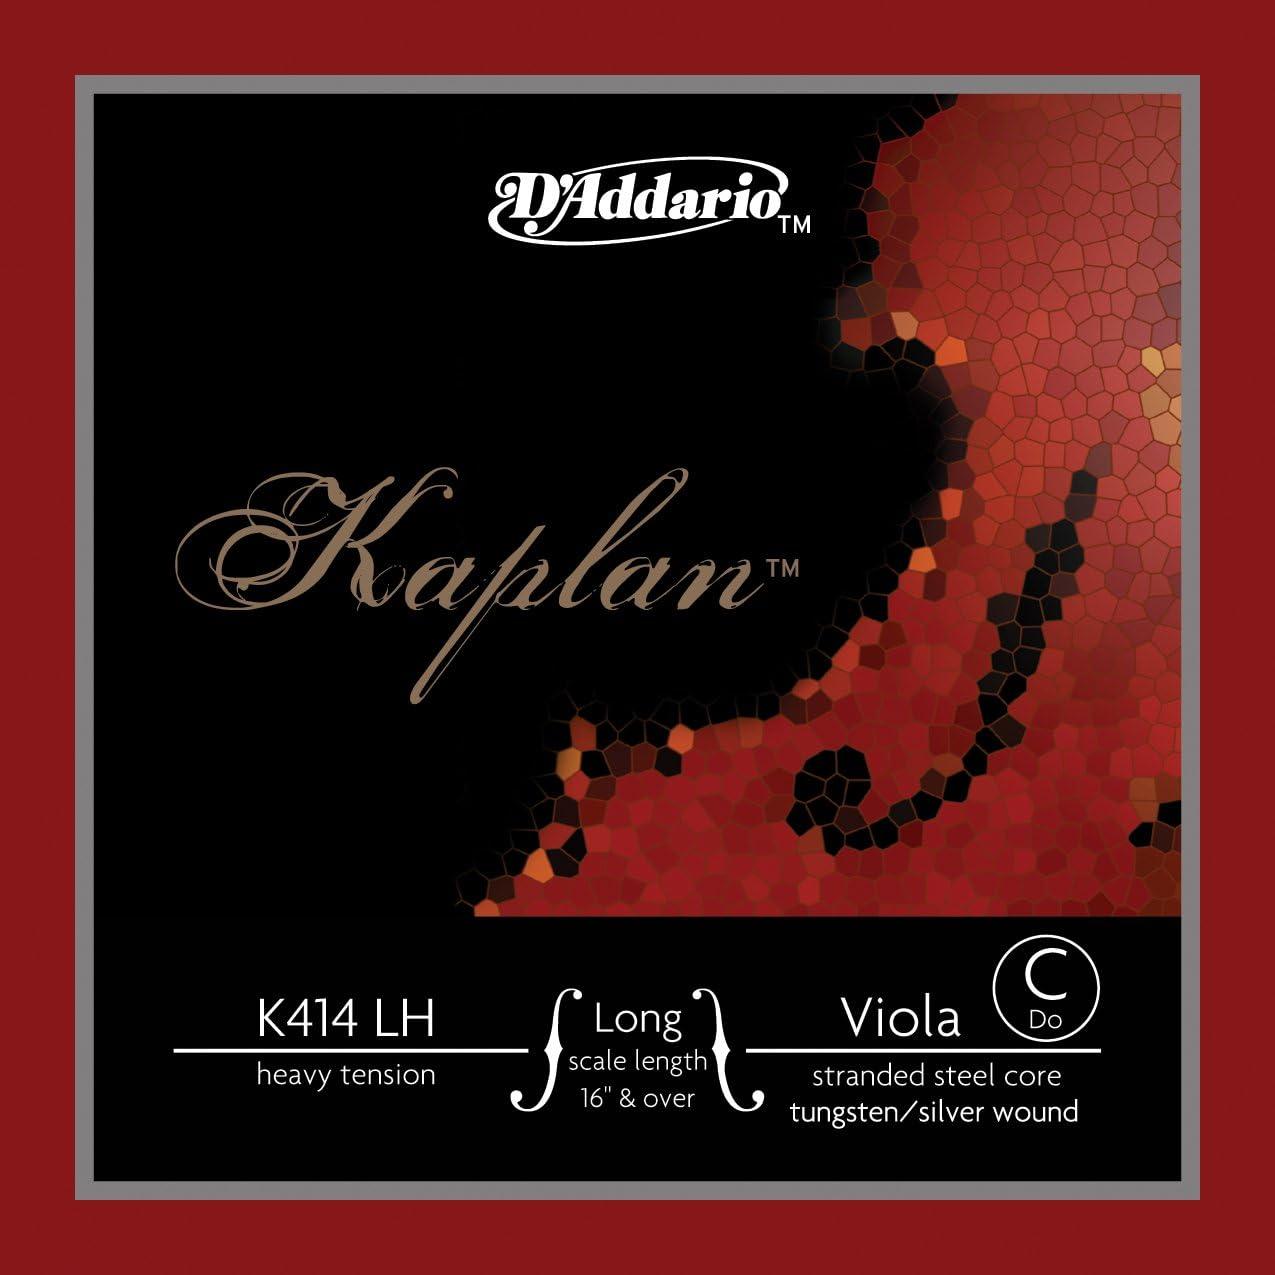 D'Addario Kaplan Viola Single wholesale C String HeavyTension Scale Max 89% OFF Long